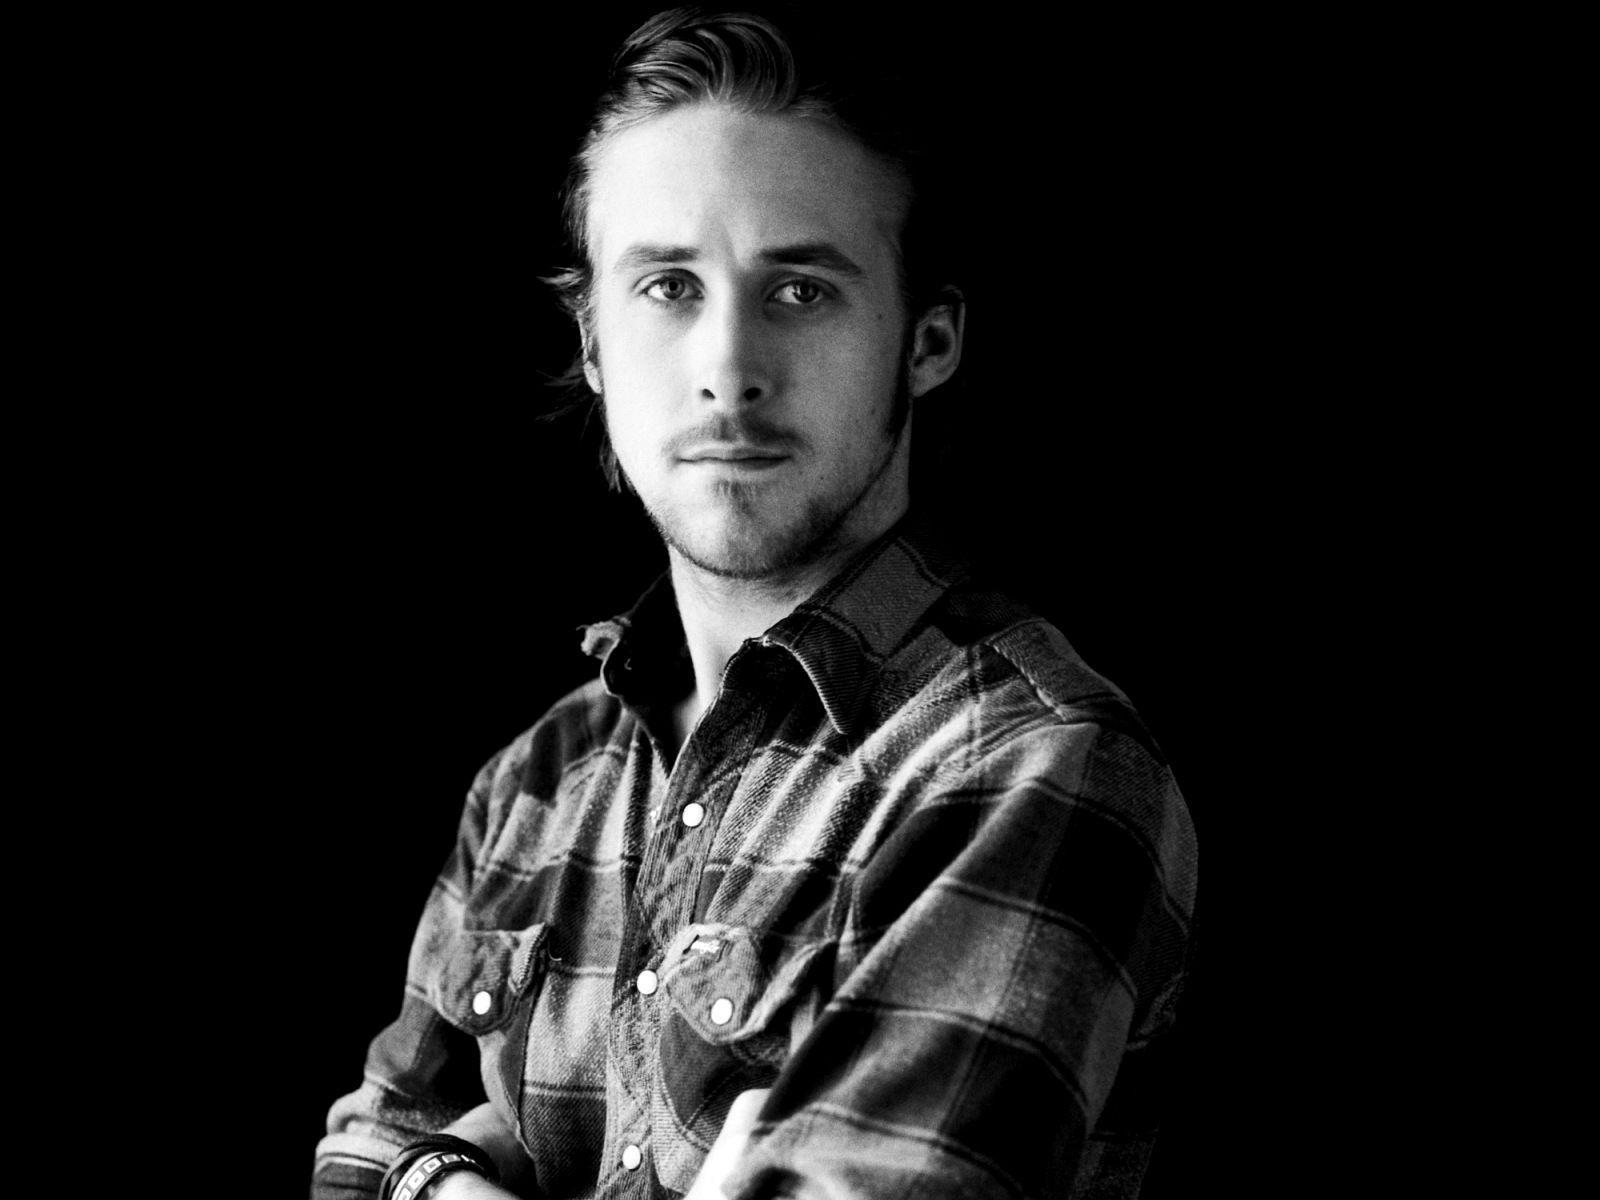 Ryan Gosling Wallpapers